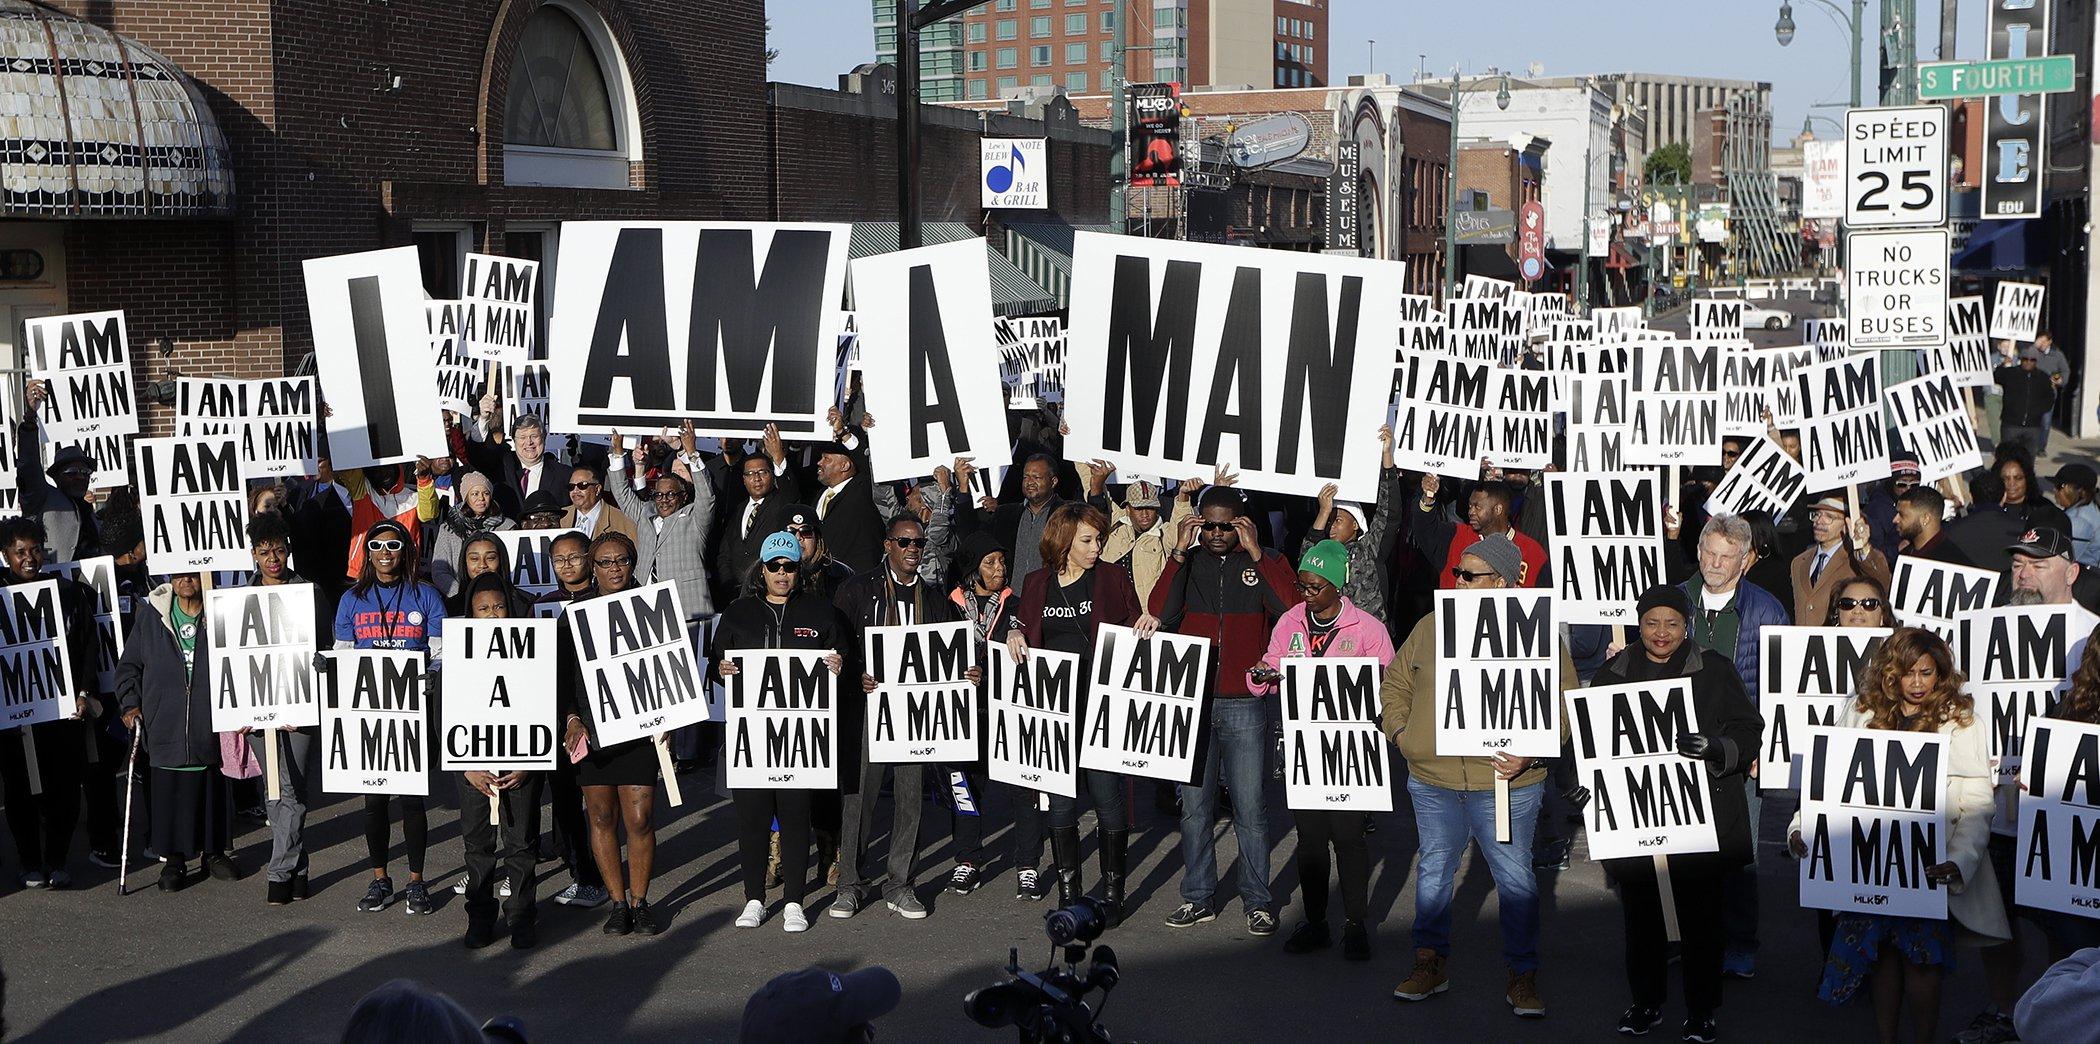 Martin-Luther-King-Jr-Assassination-50th-Anniversary.jpg